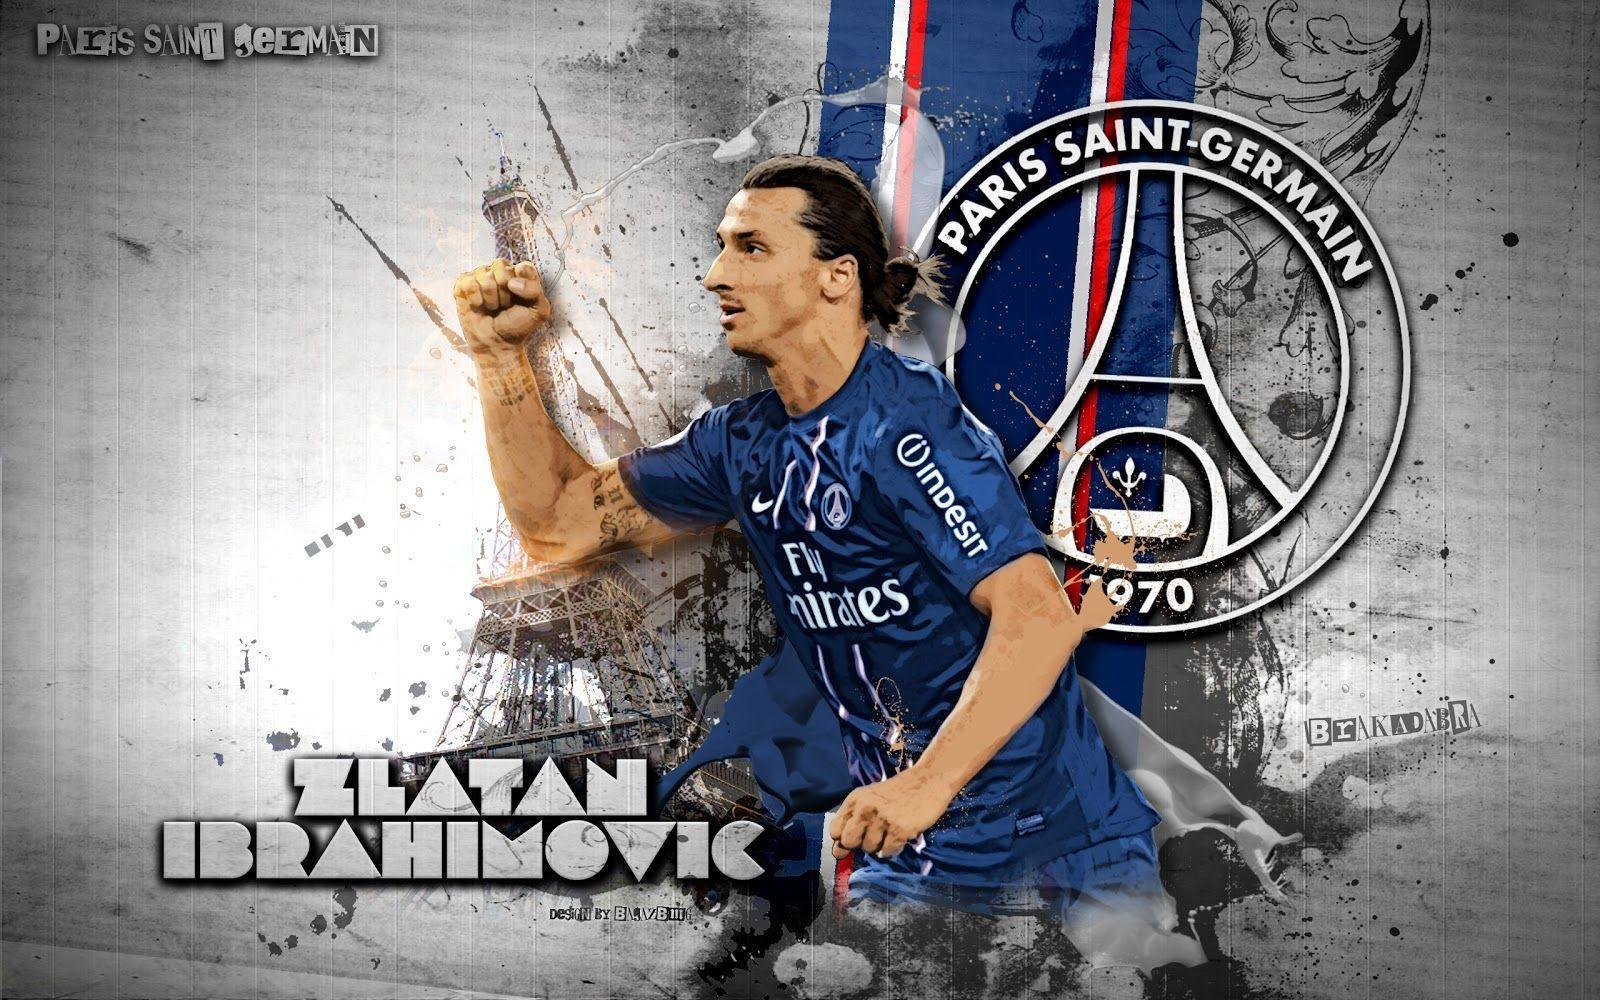 Zlatan Ibrahimovic Wallpaper 39120 in Football - Telusers.com